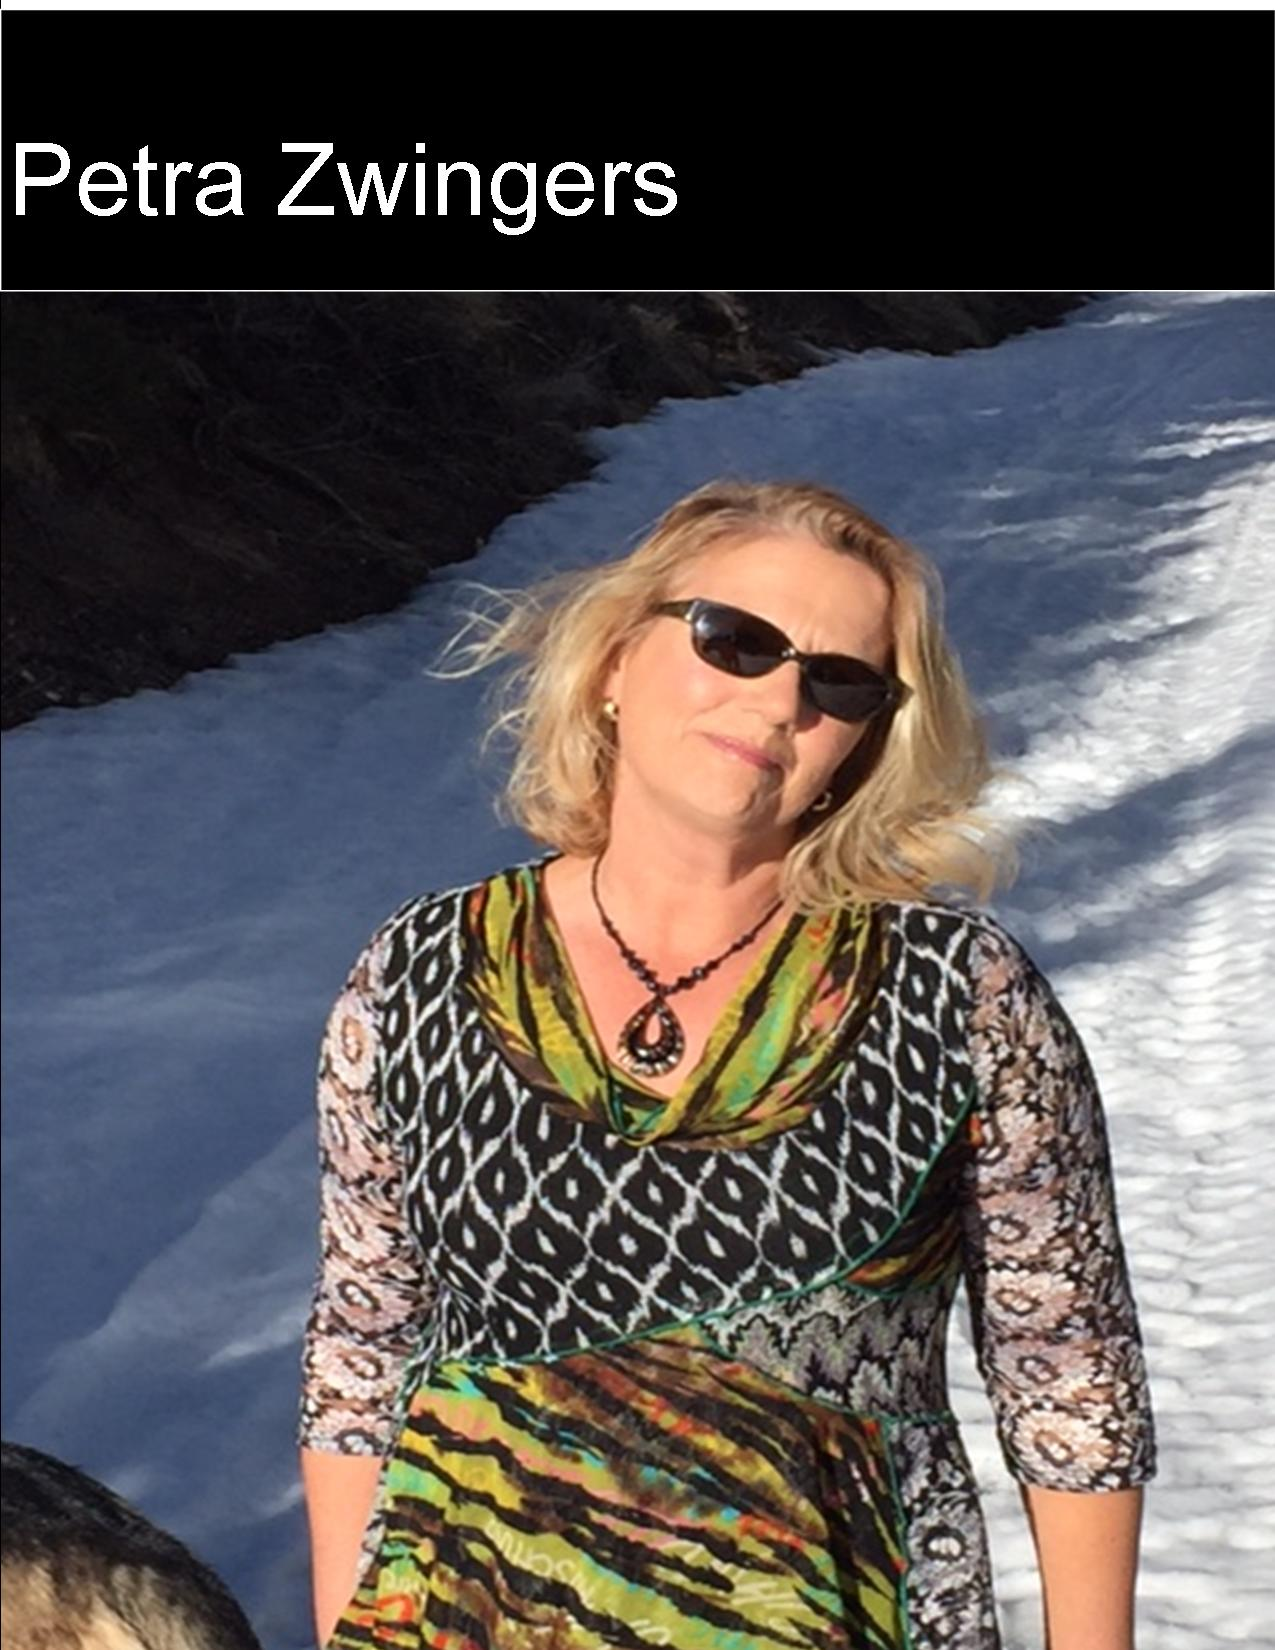 Petra Zwingers